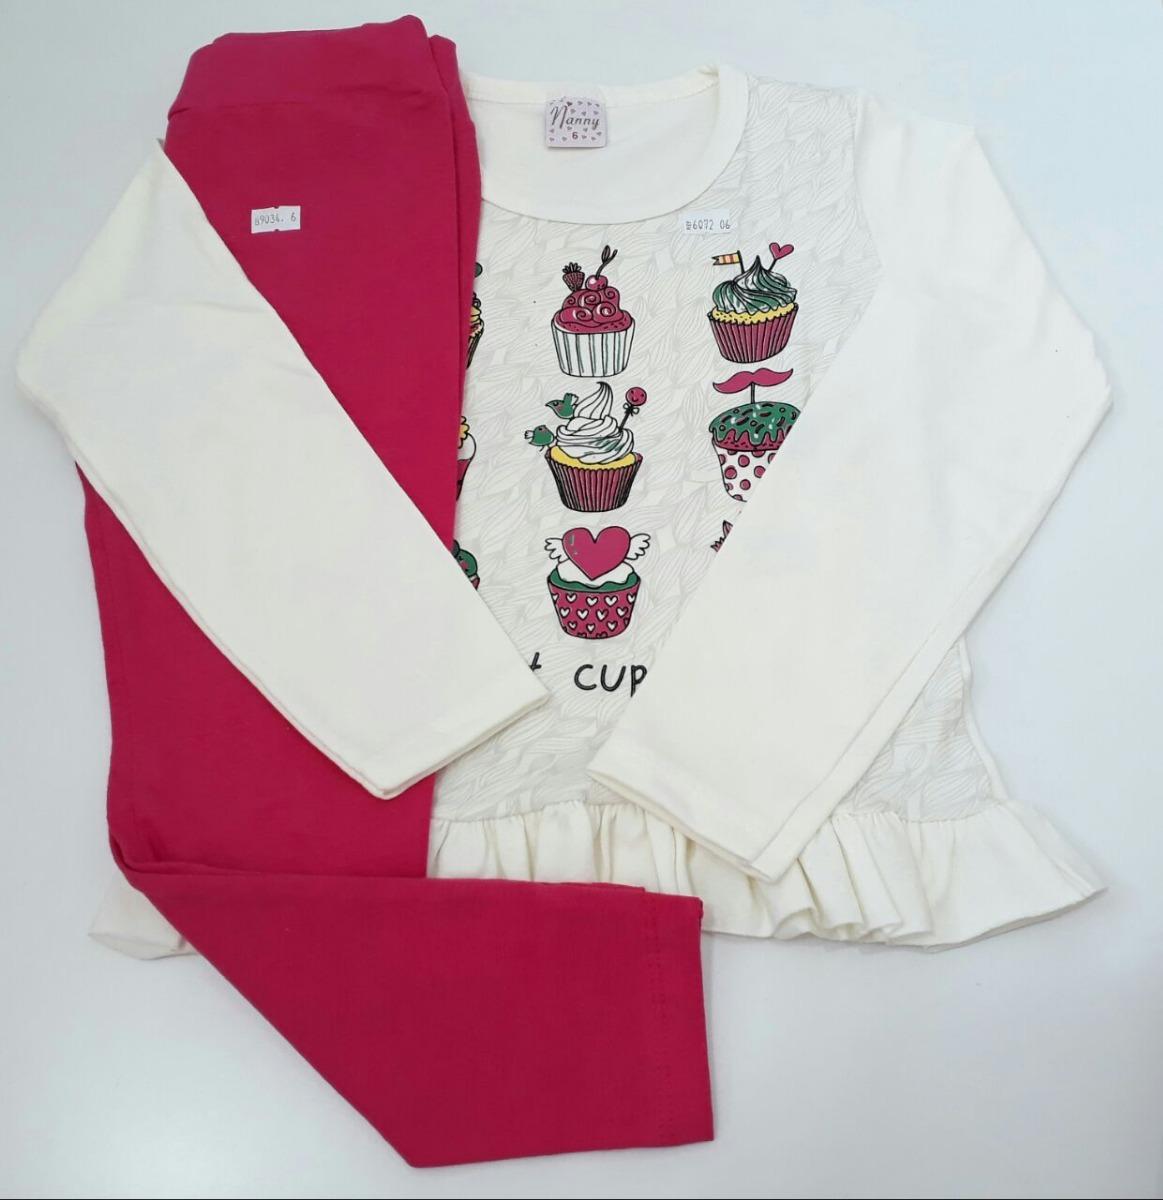 15b8917439 kit 3 roupas infantil atacado conjunto menina alta qualidade. Carregando  zoom.